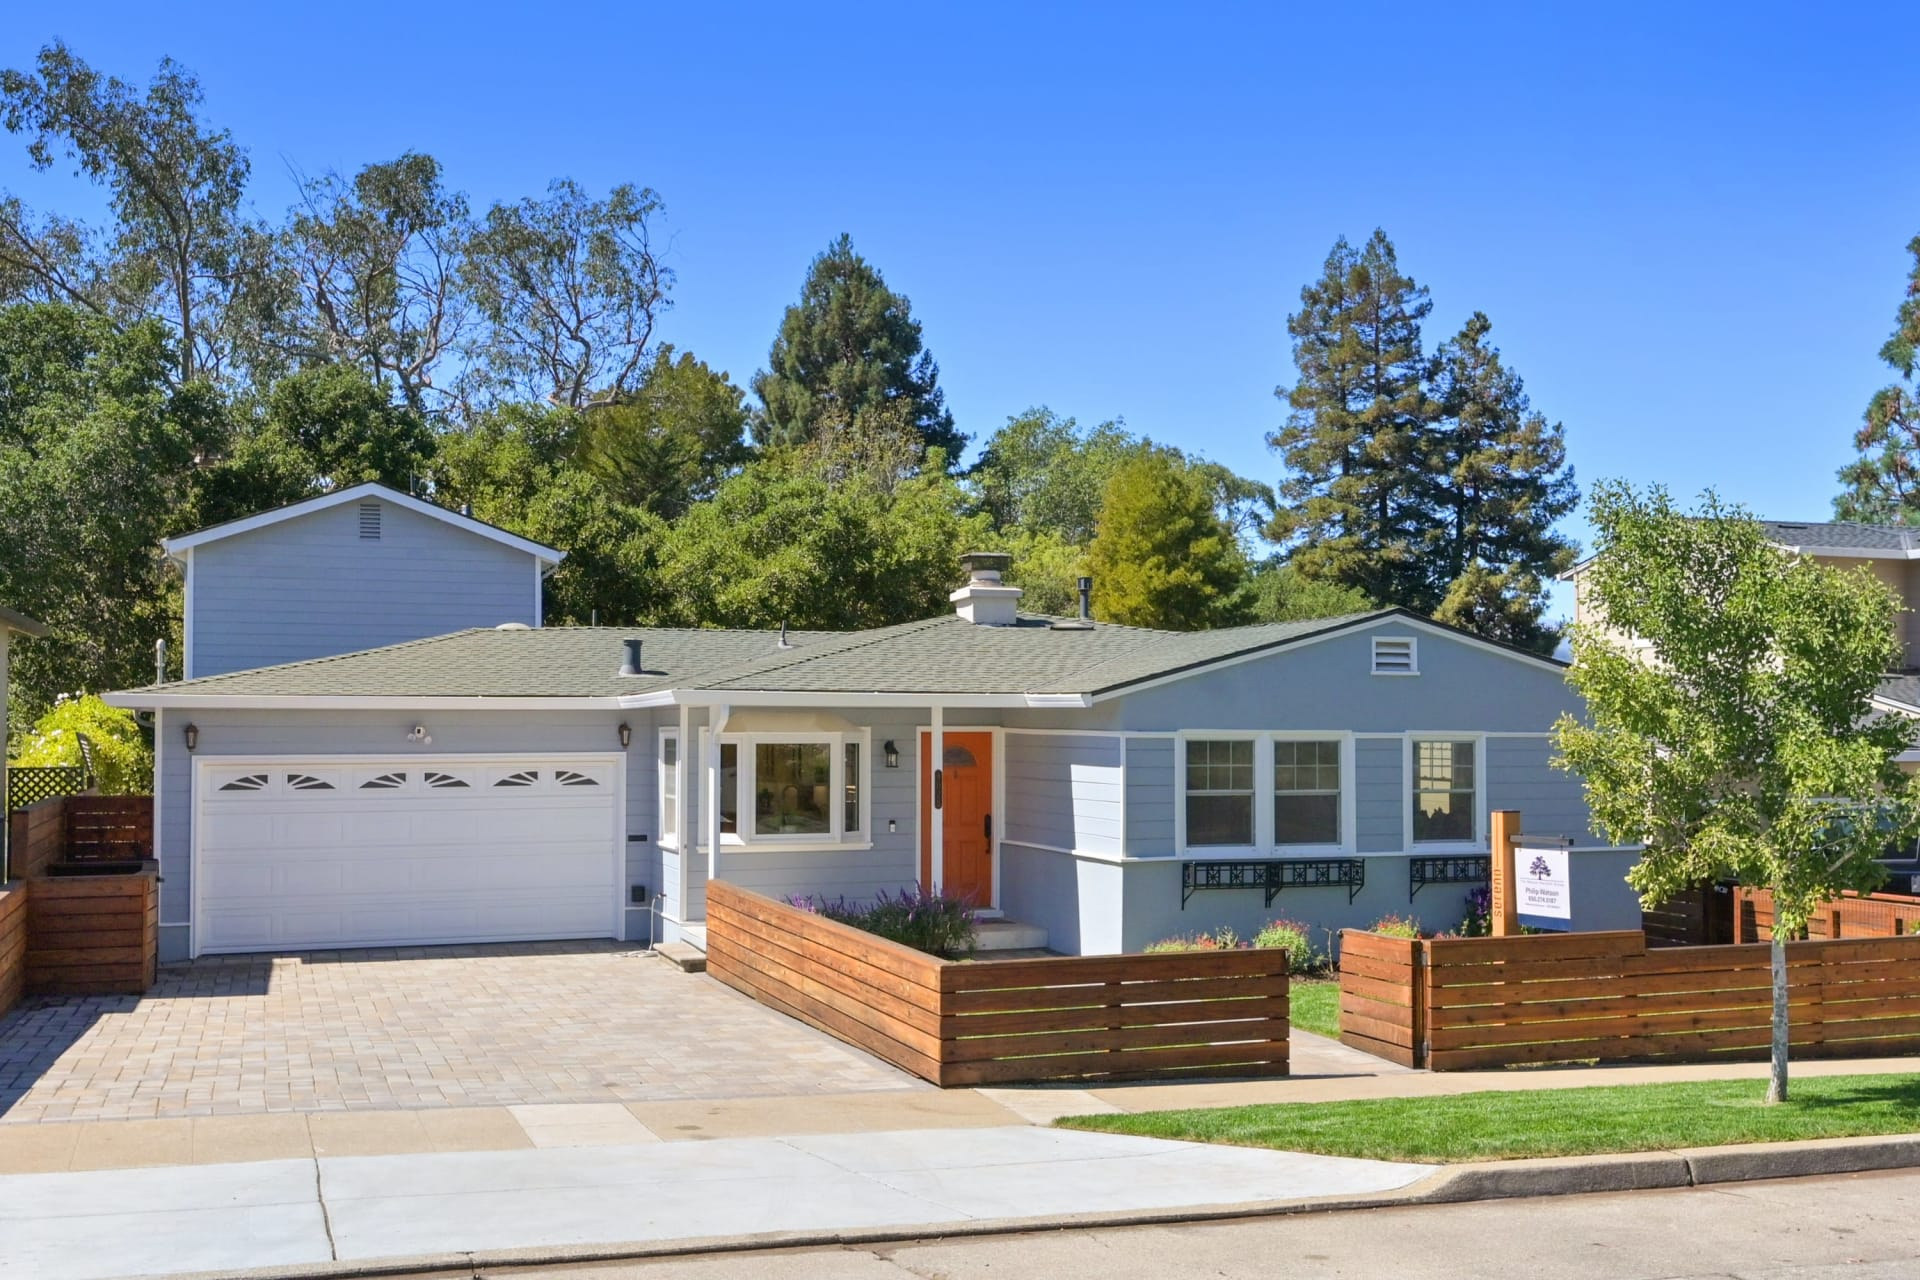 4028 Alameda De Las Pulgas, San Mateo, California  video preview